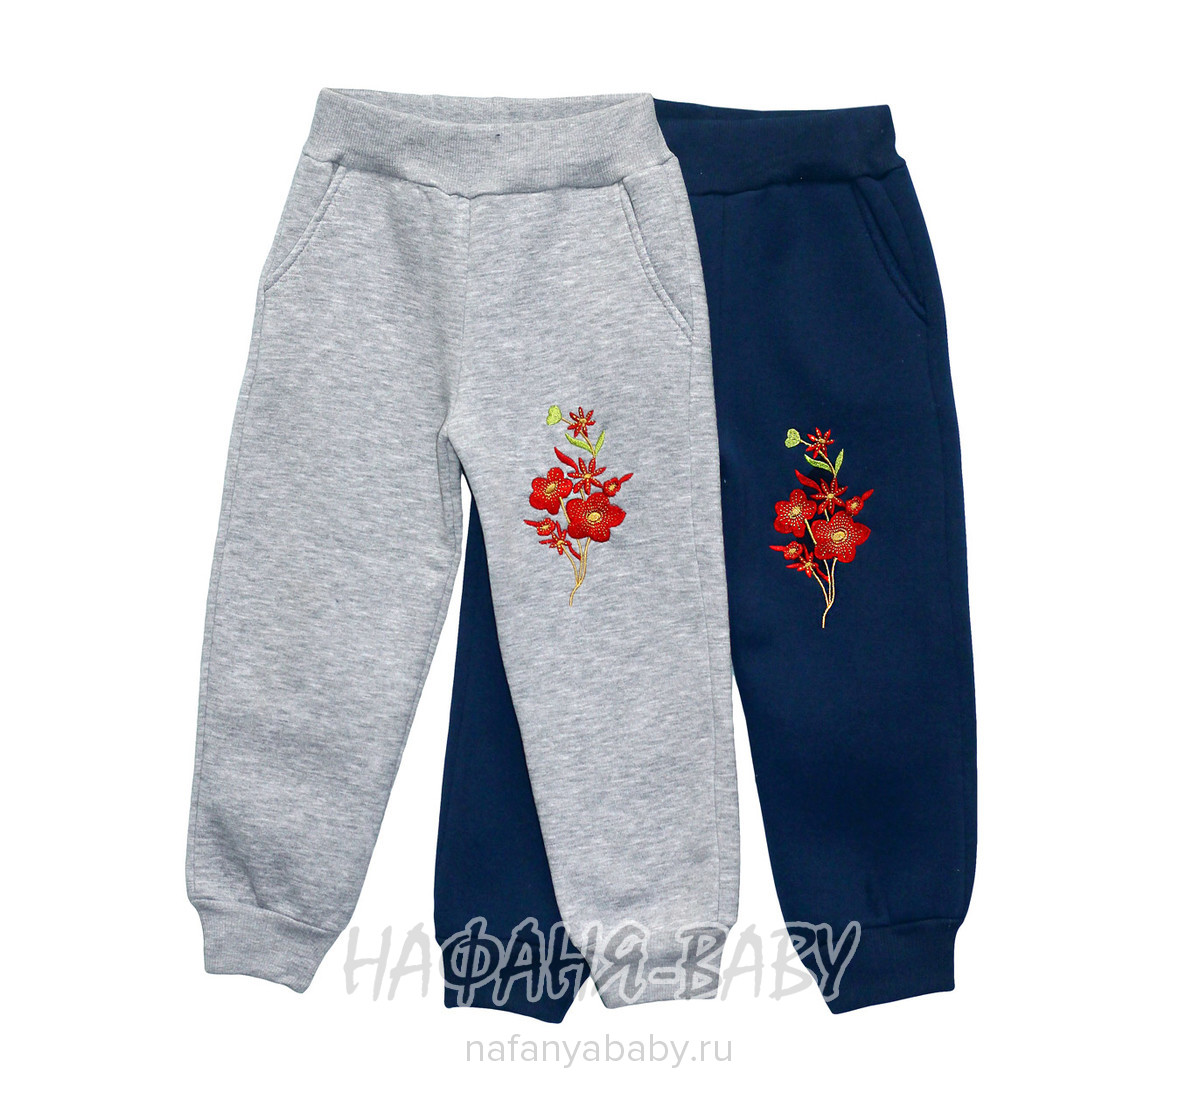 Детские брюки COCUK арт: 1712, 5-9 лет, оптом Турция